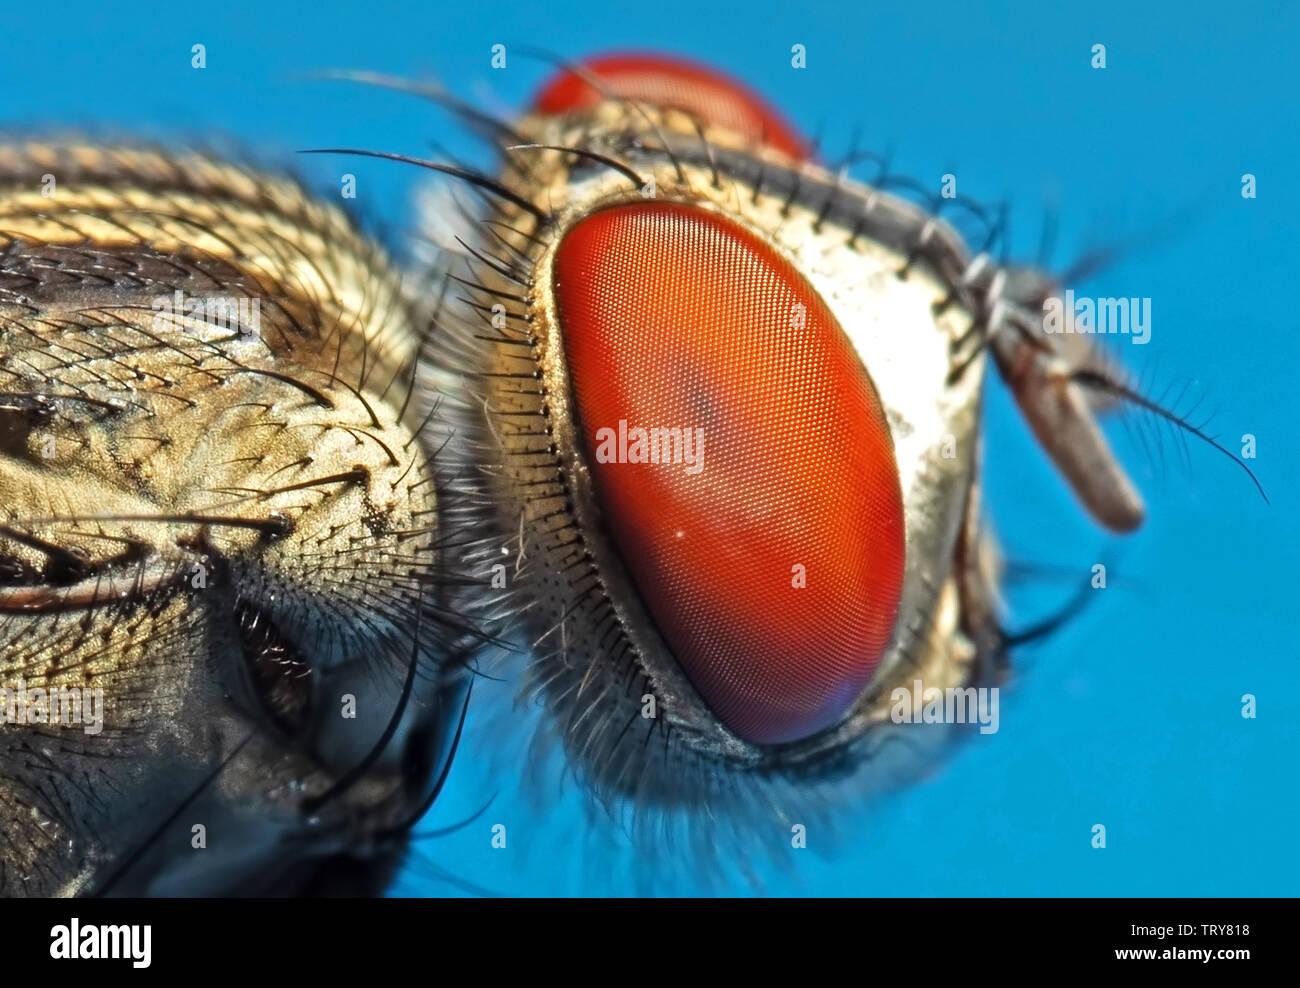 Macro Photography of Housefly Isolated on Background - Stock Image